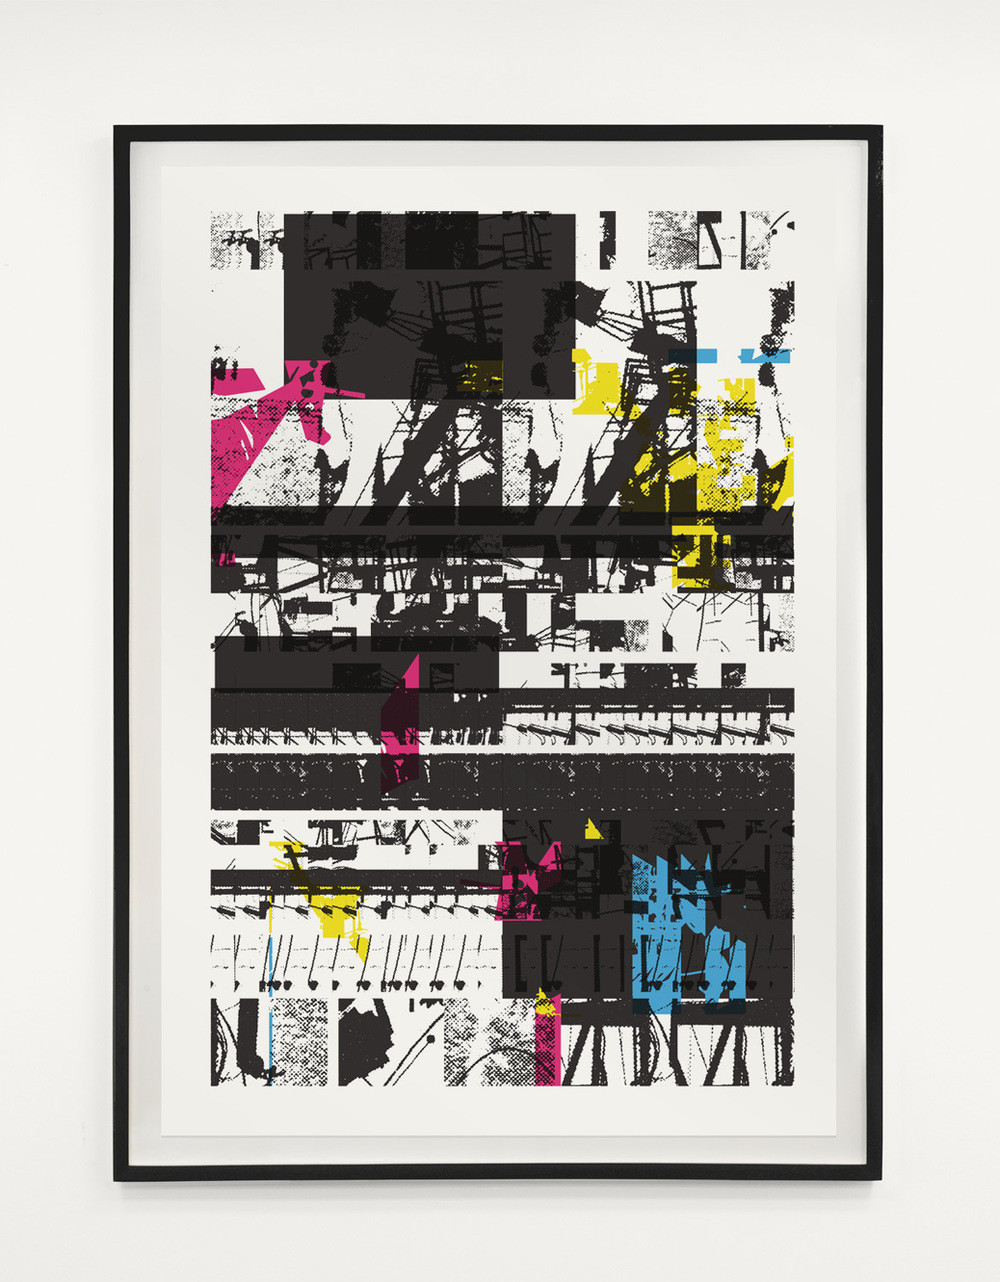 Tom Tebby Visual Artist - Untitled Digital print on paper